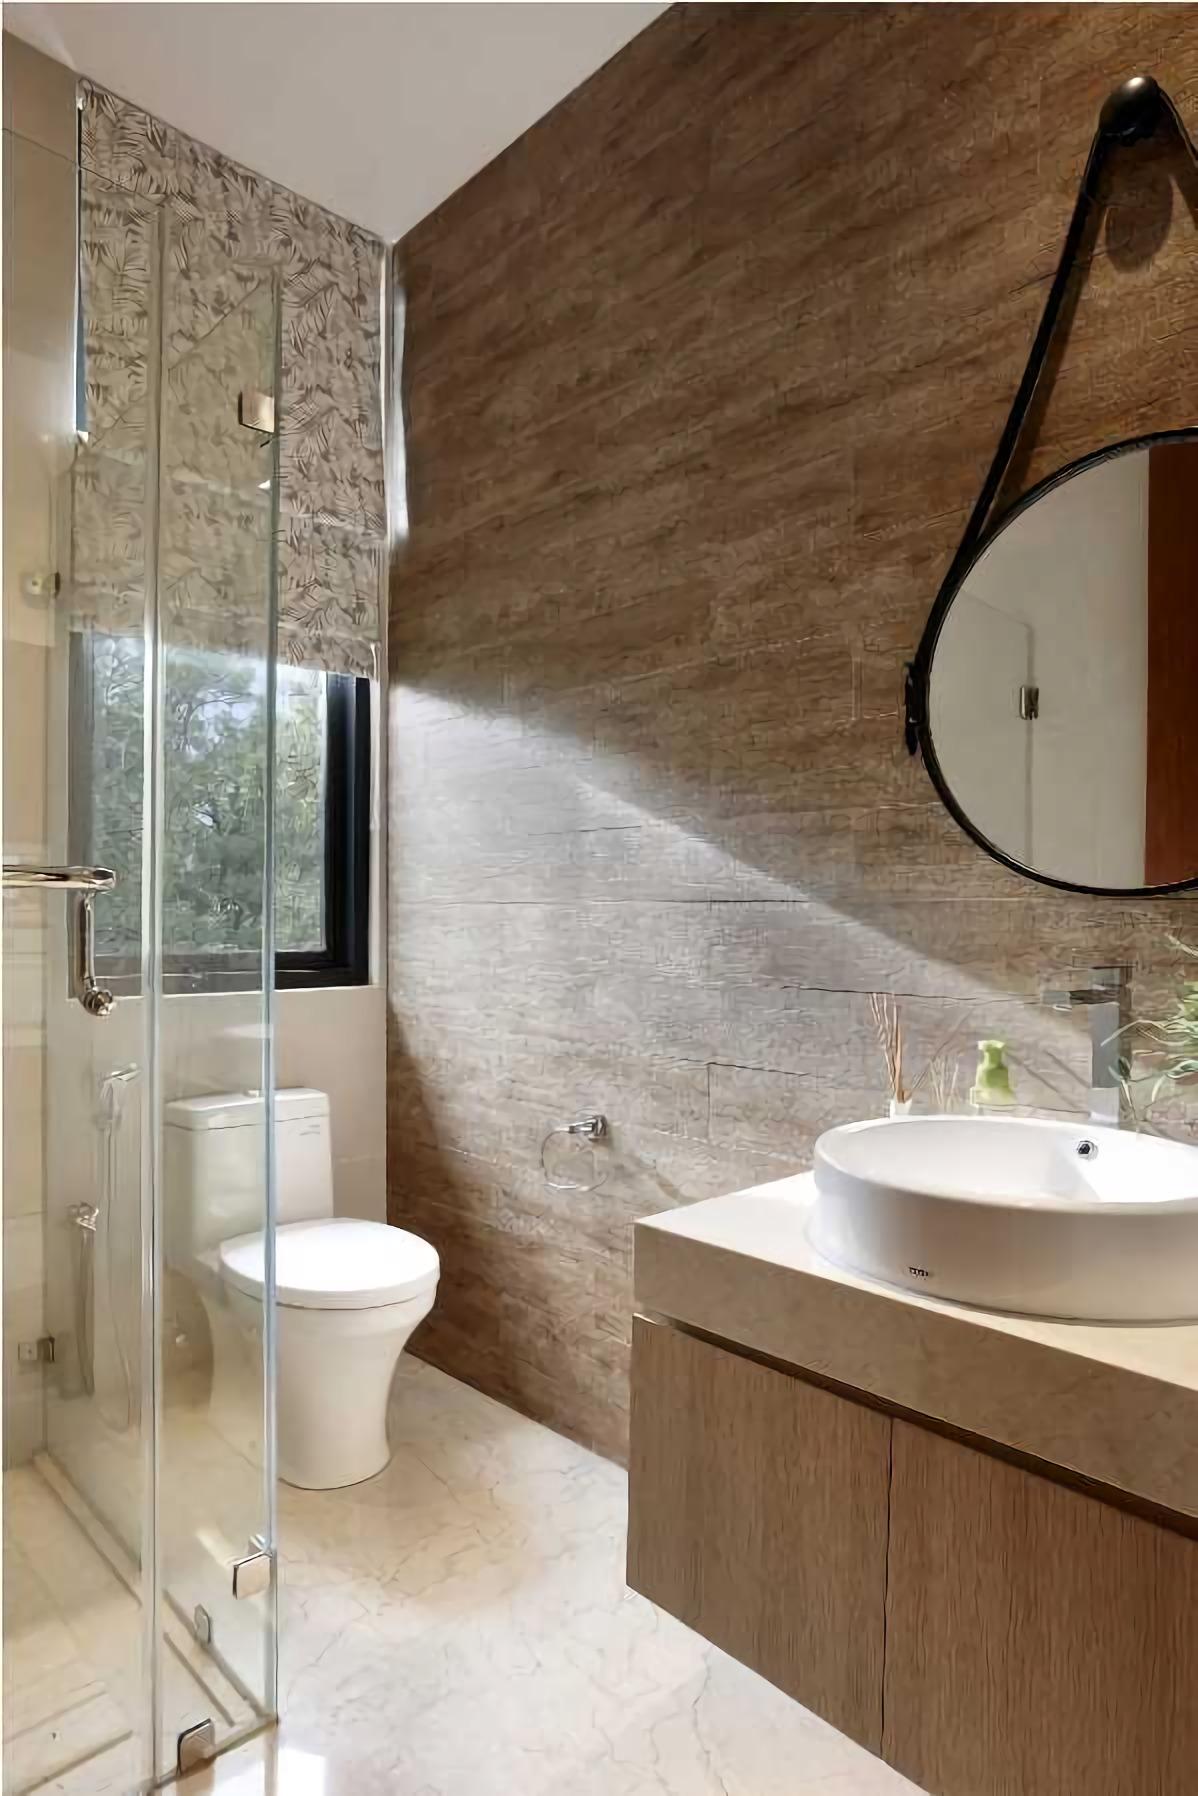 Bentuk lengkung yang fungsional dari fixture kamar mandi Villa Indah (Sumber: arsitag.com)